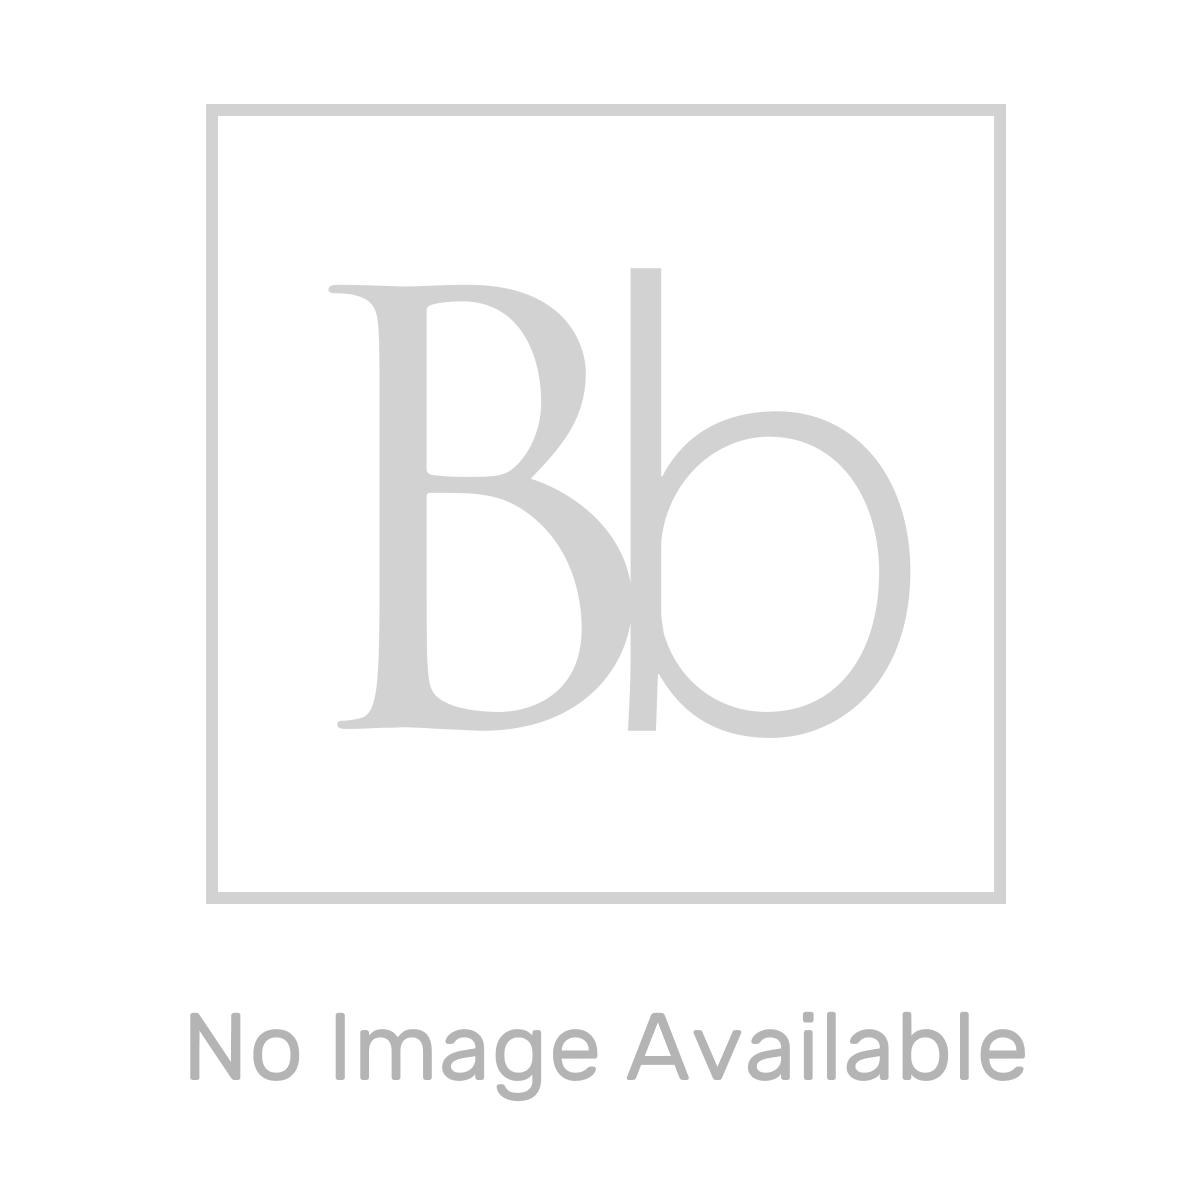 RAK Surface Cool Grey Lappato Tile 600 x 600mm